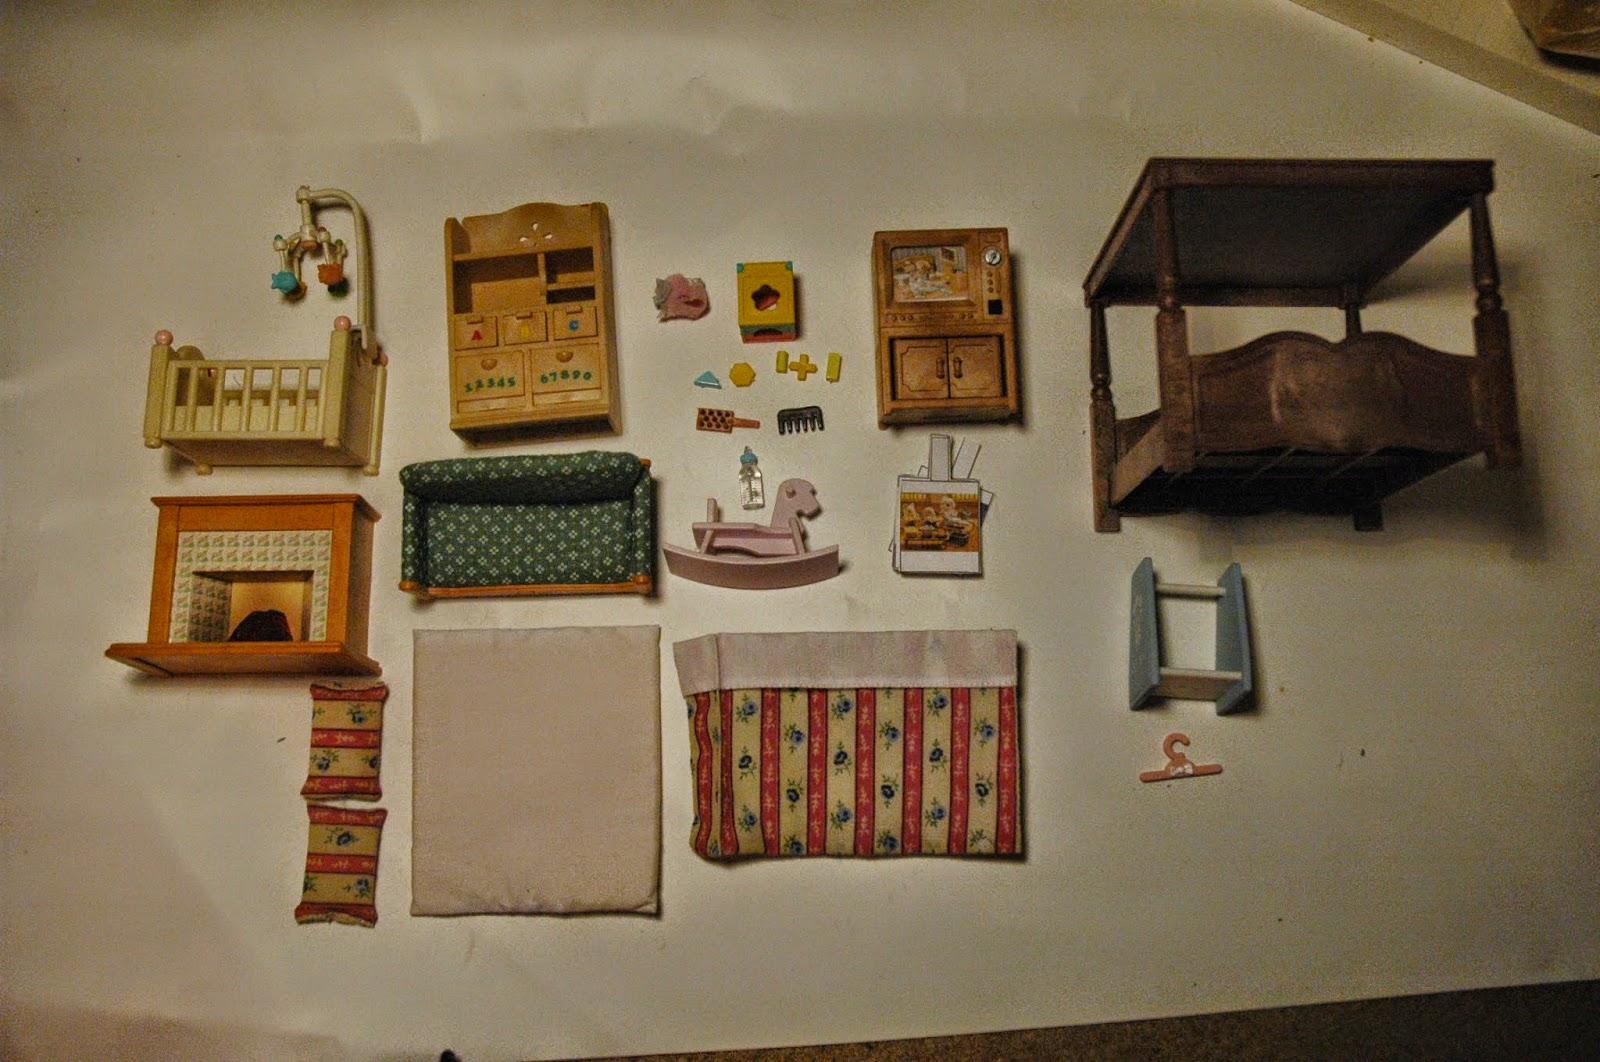 Sylvanian Families Bedroom Furniture Set Butterfly Lullaby Sharon J Bainbridge Sylvanian Families Hotel